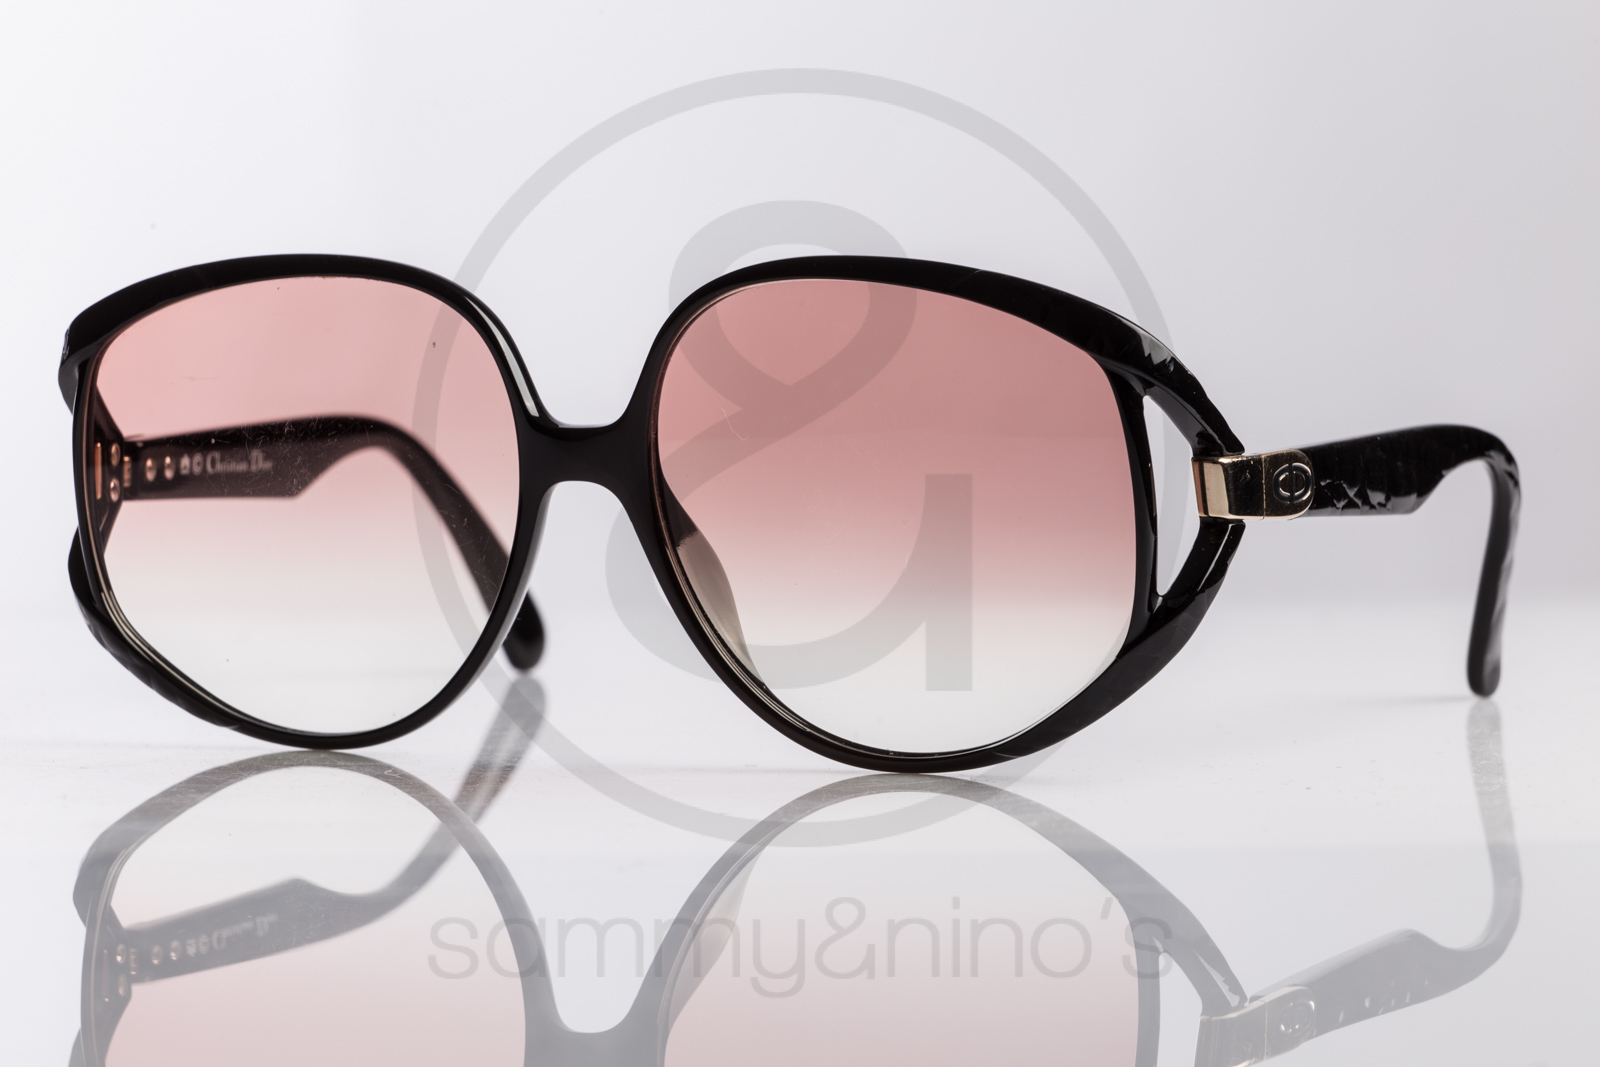 Dior Glasses Frame 2015 : Christian Dior 2320 Sammy & Ninos Store